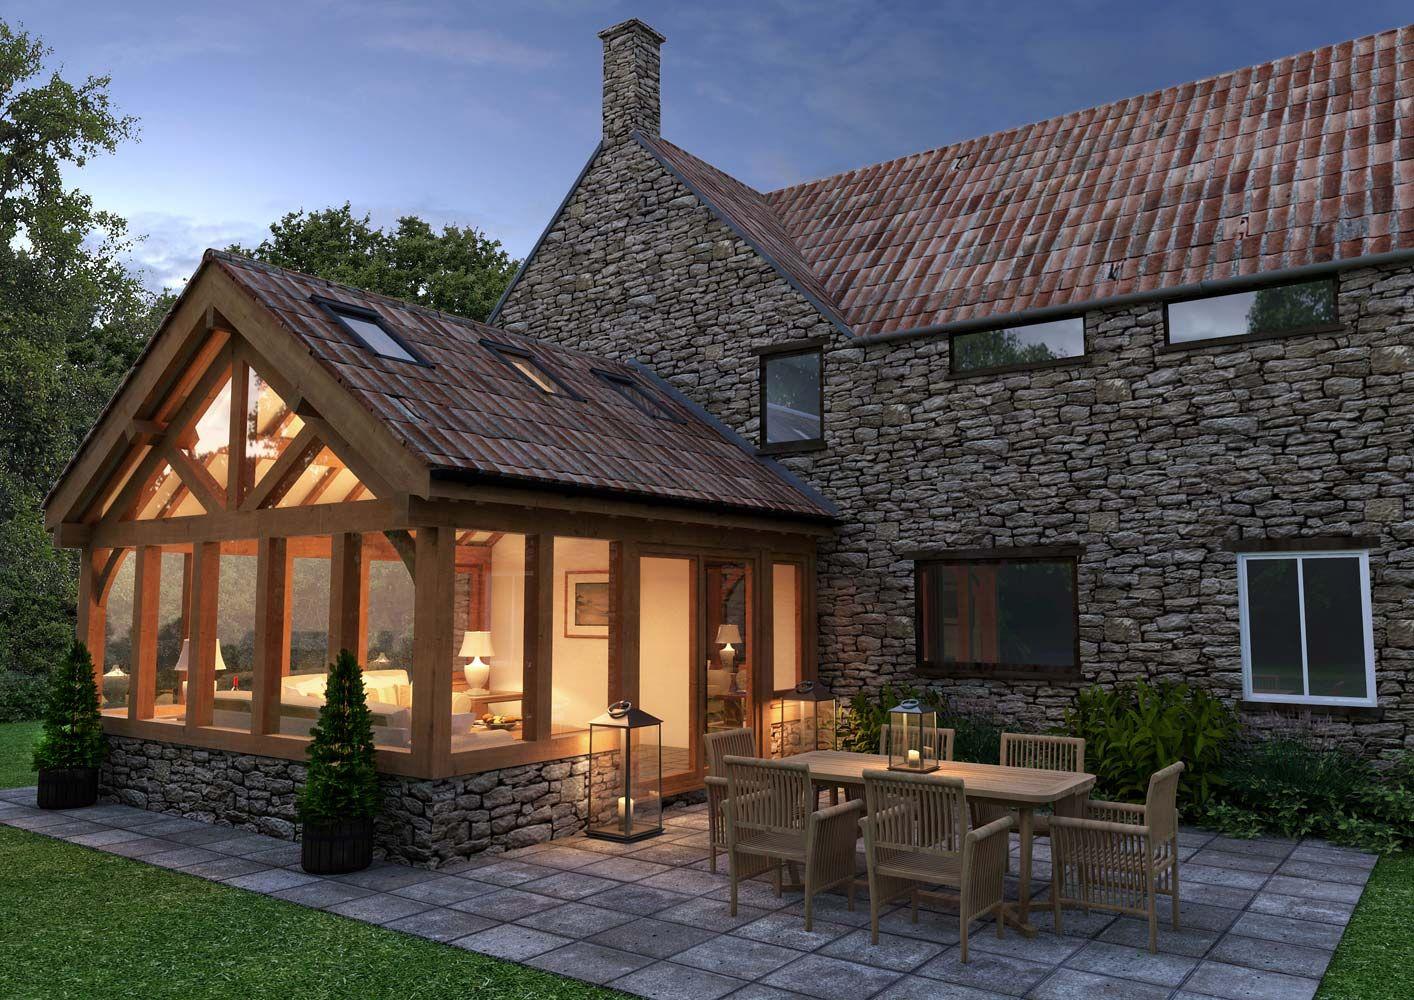 oak framed garden rooms arboreta architecture timber frame log pinterest winterg rten. Black Bedroom Furniture Sets. Home Design Ideas